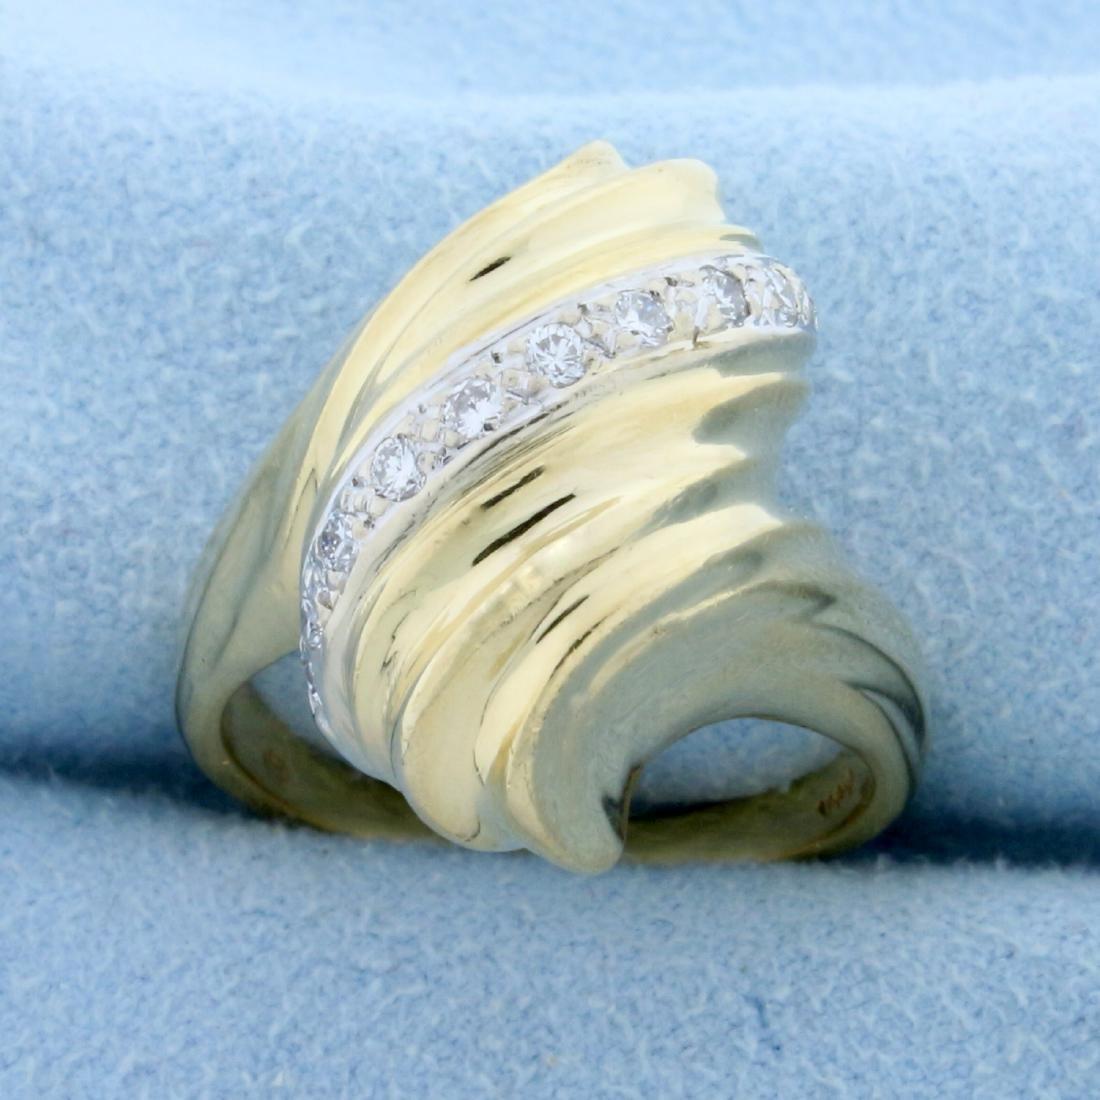 Designer Swirling Scroll Design Ring in 14K Yellow Gold